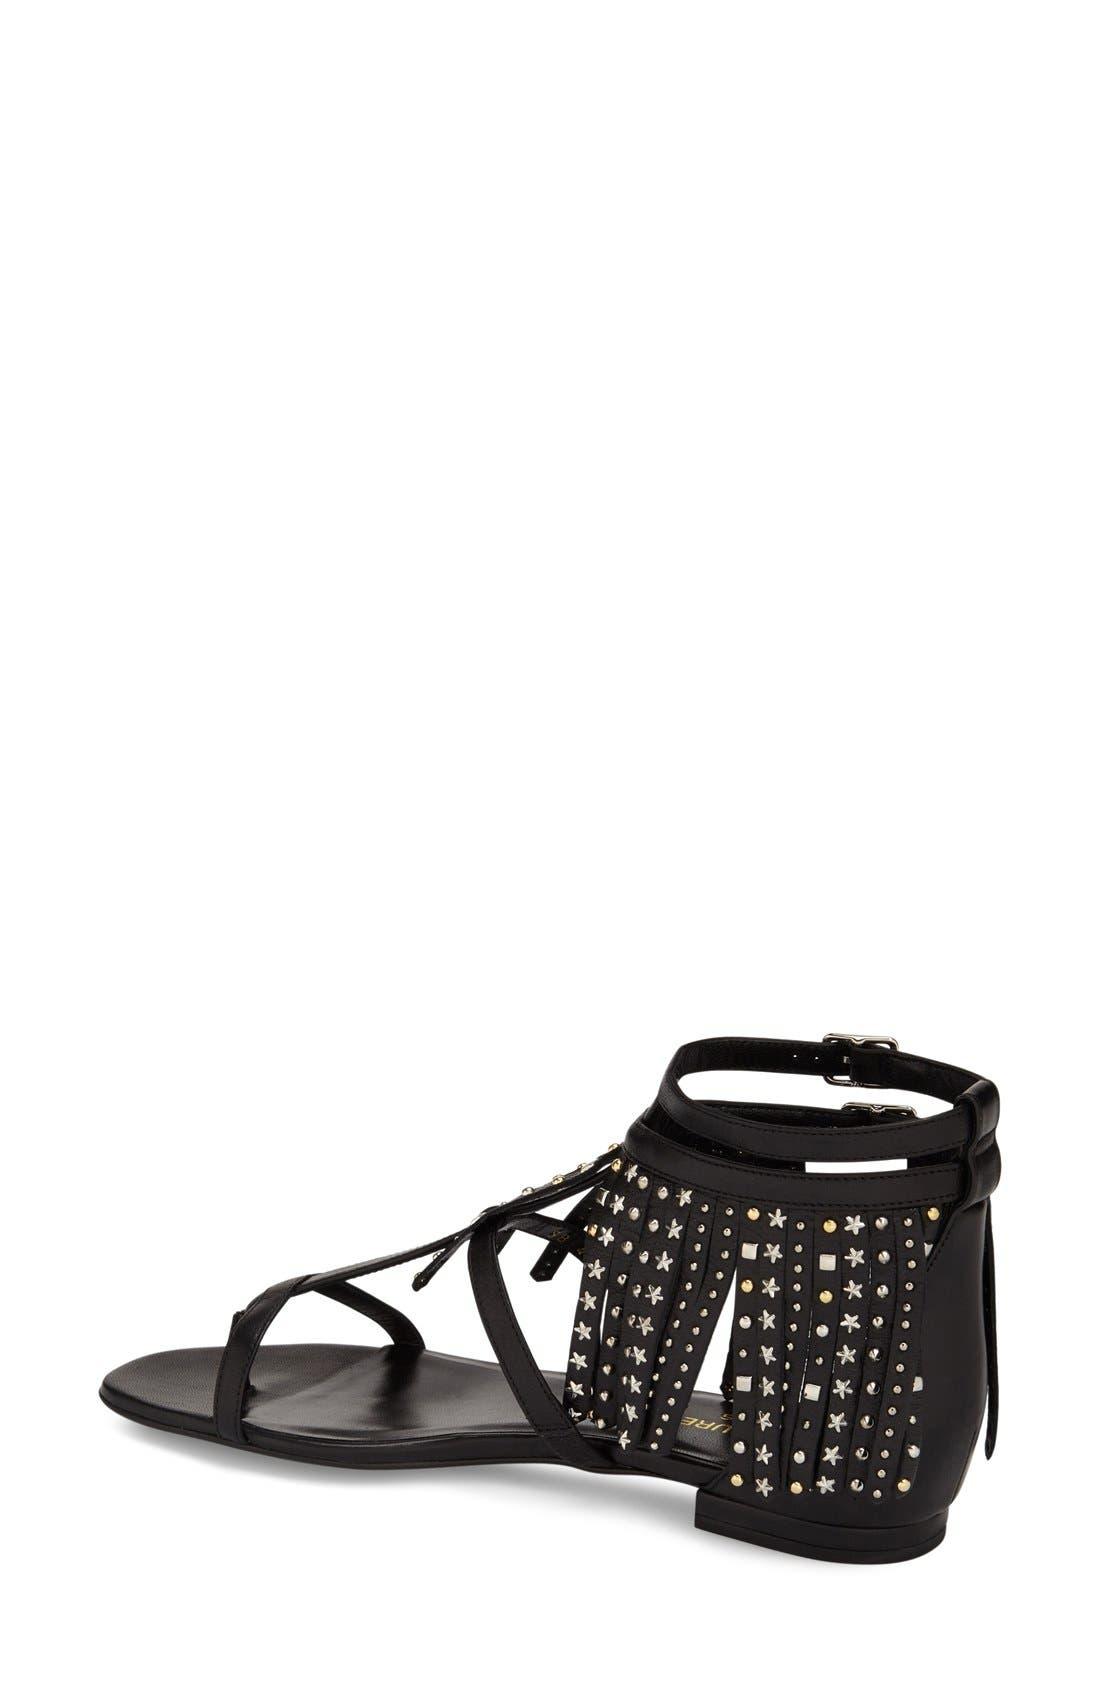 Alternate Image 2  - Saint Laurent 'Nu' Studded Fringe Sandal (Women)